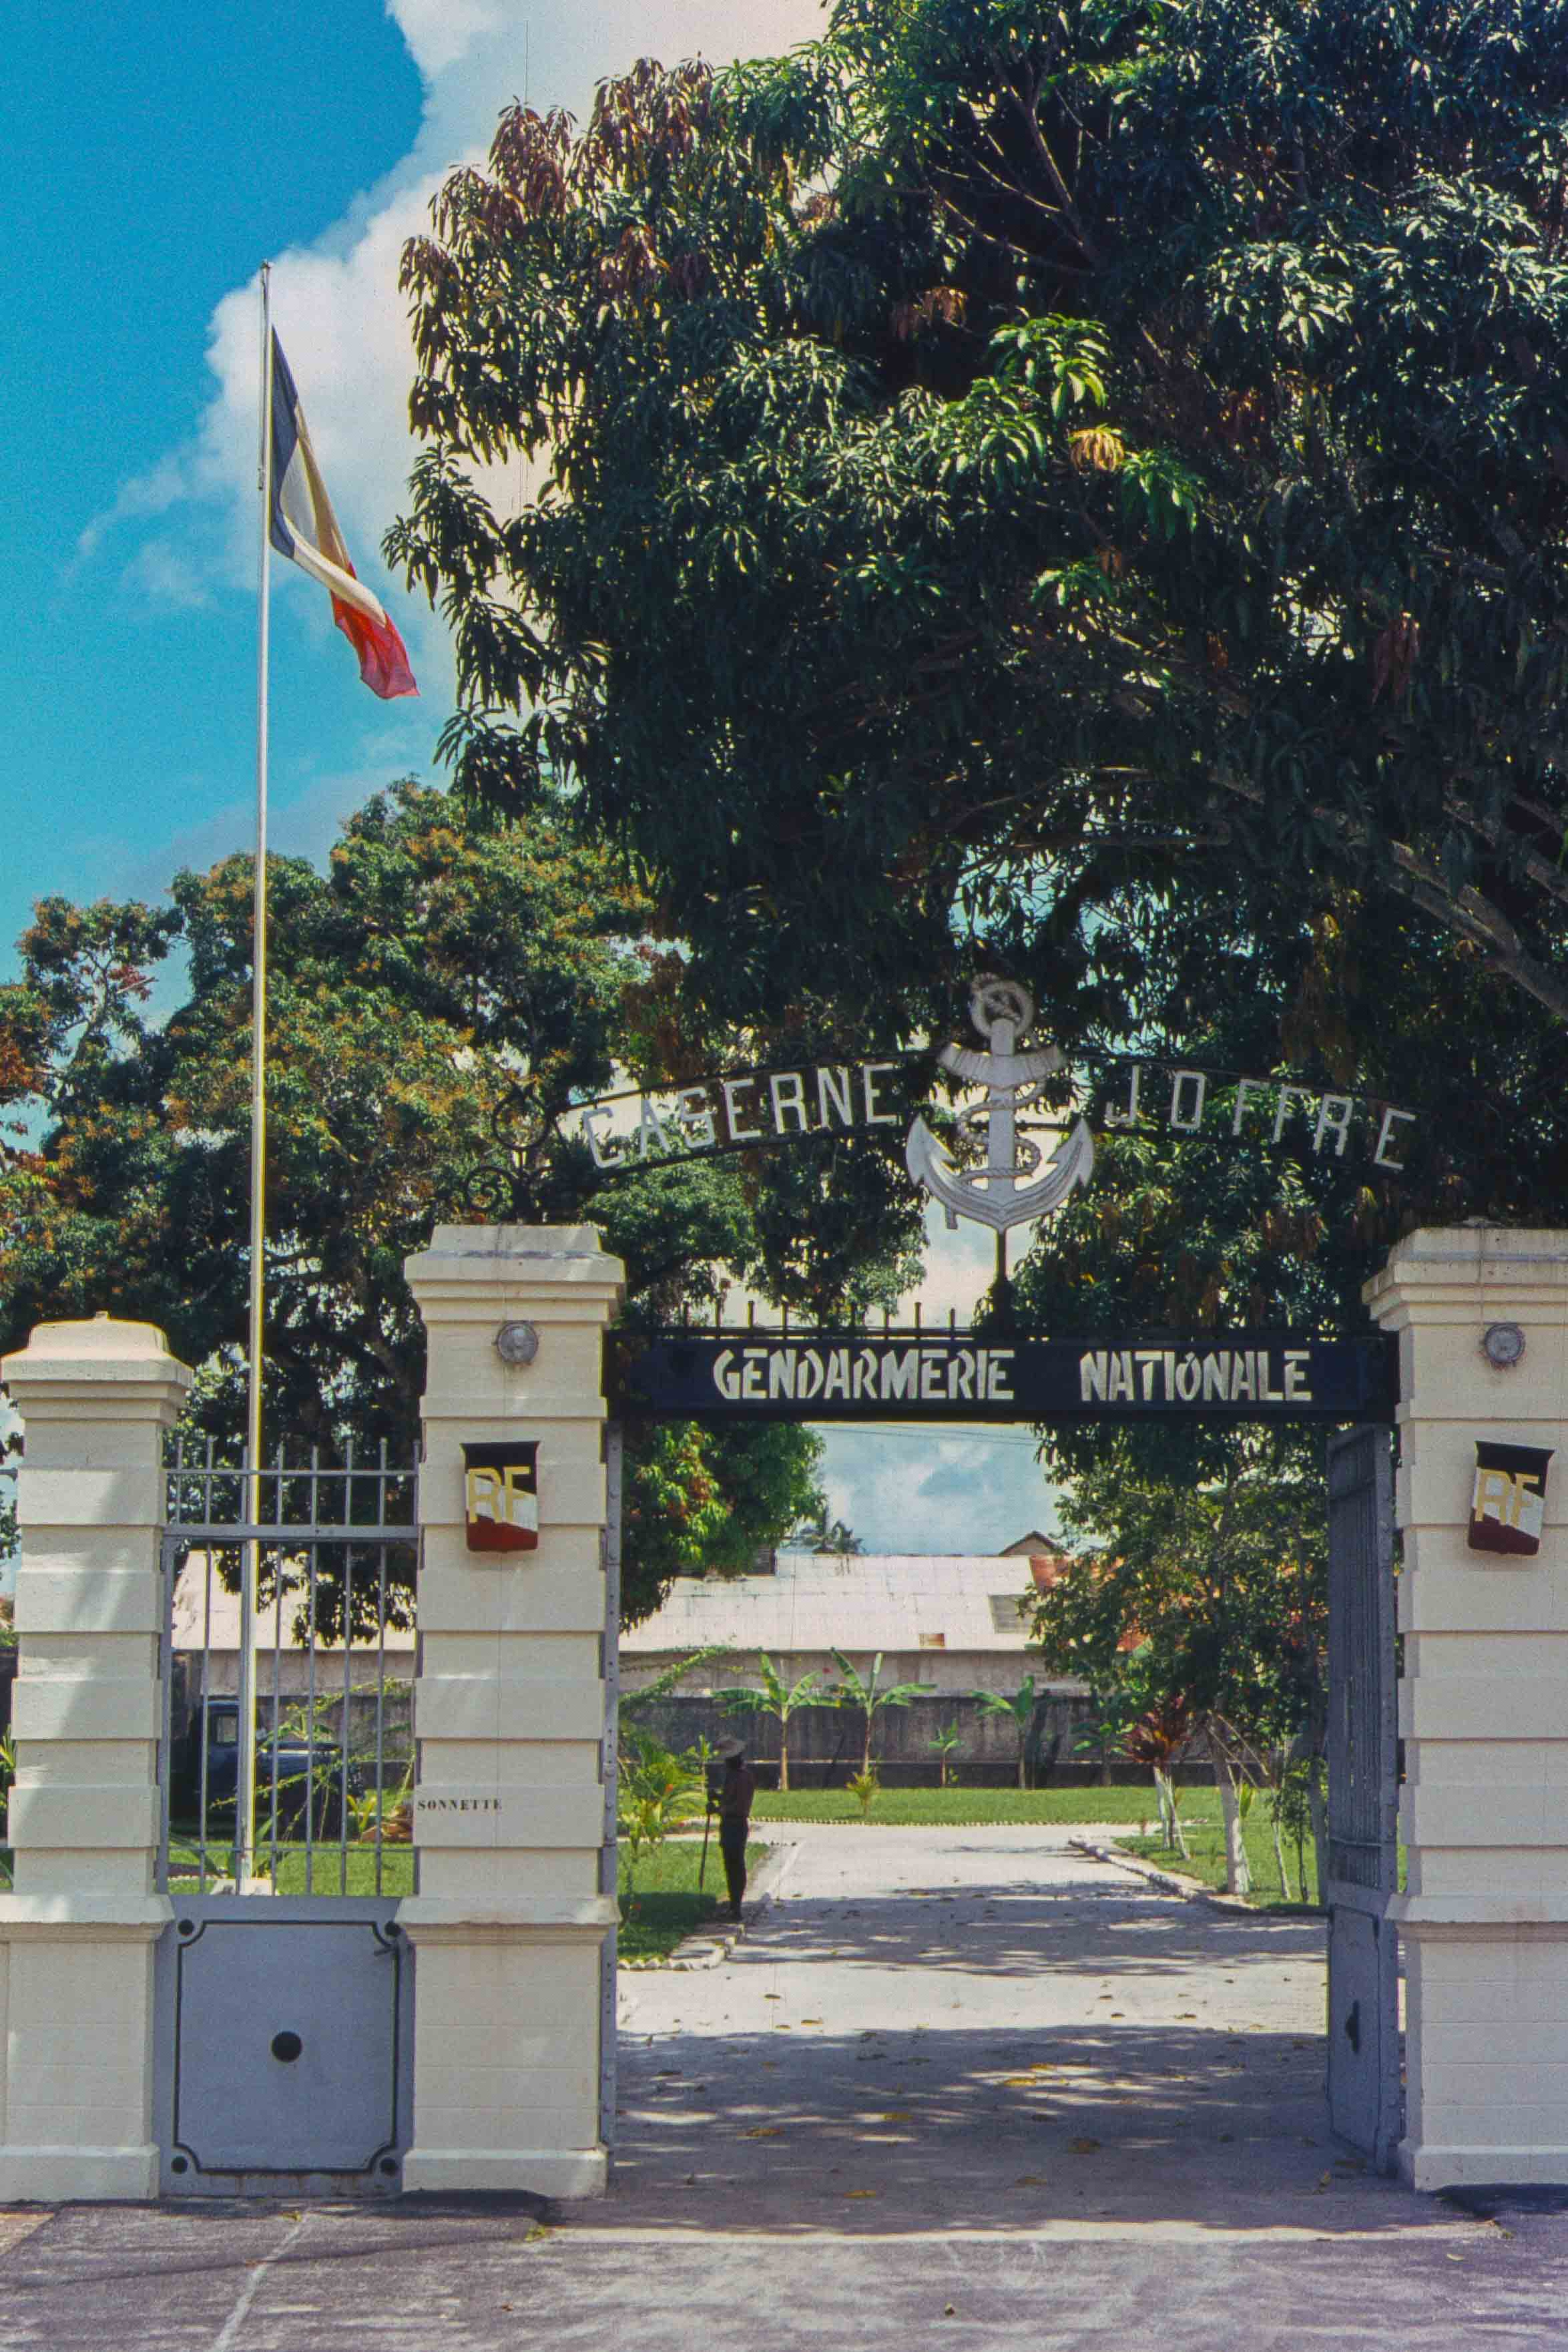 432. Suriname